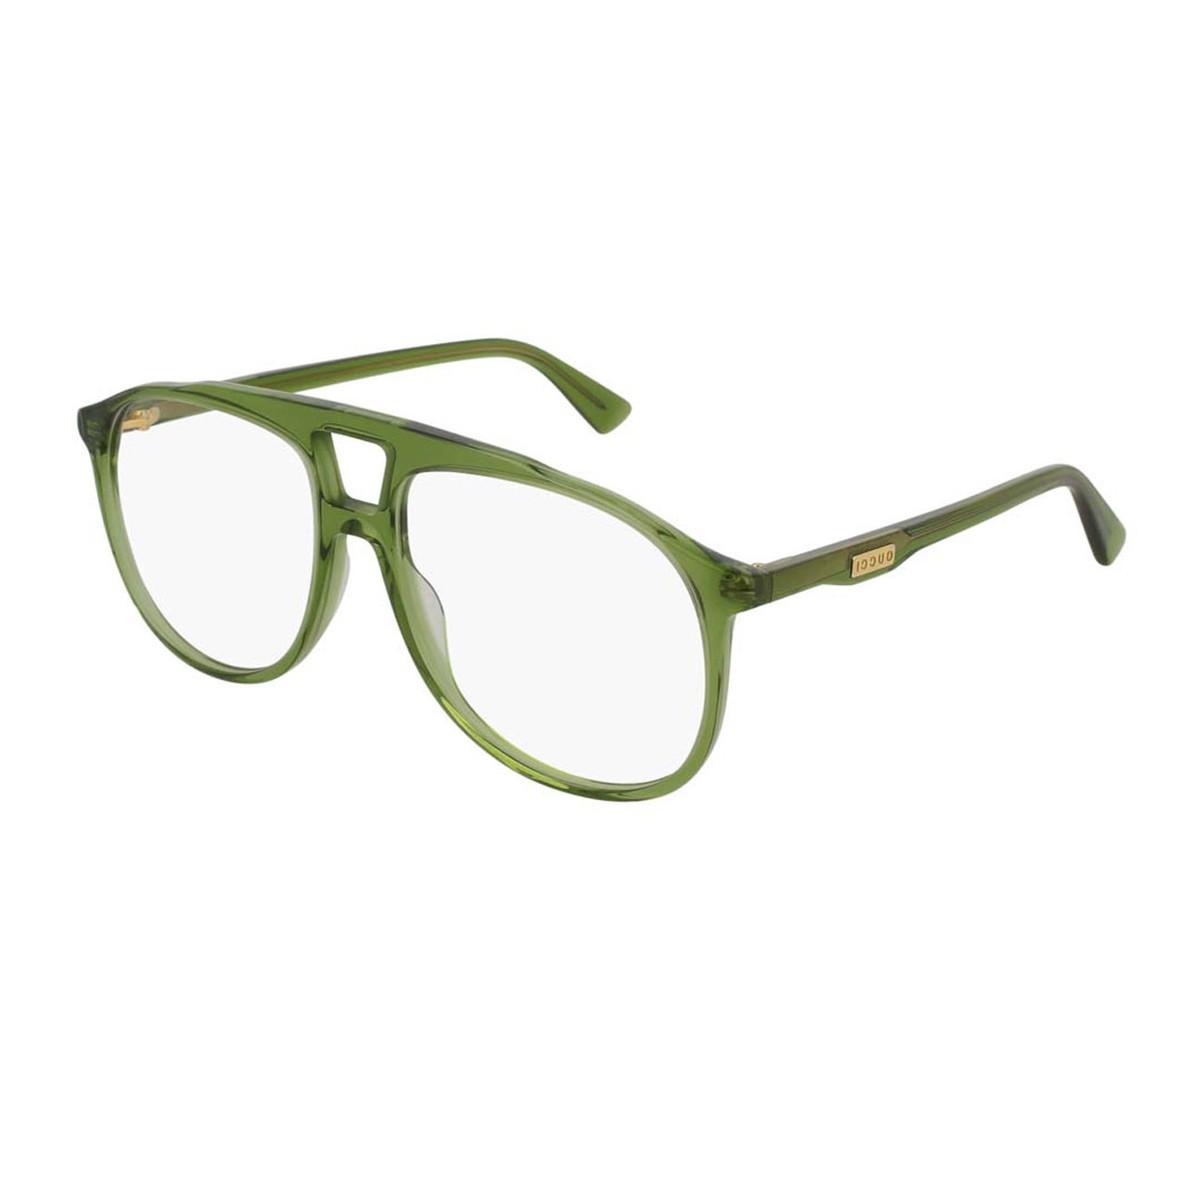 Gucci GG0264O | Occhiali da vista Unisex